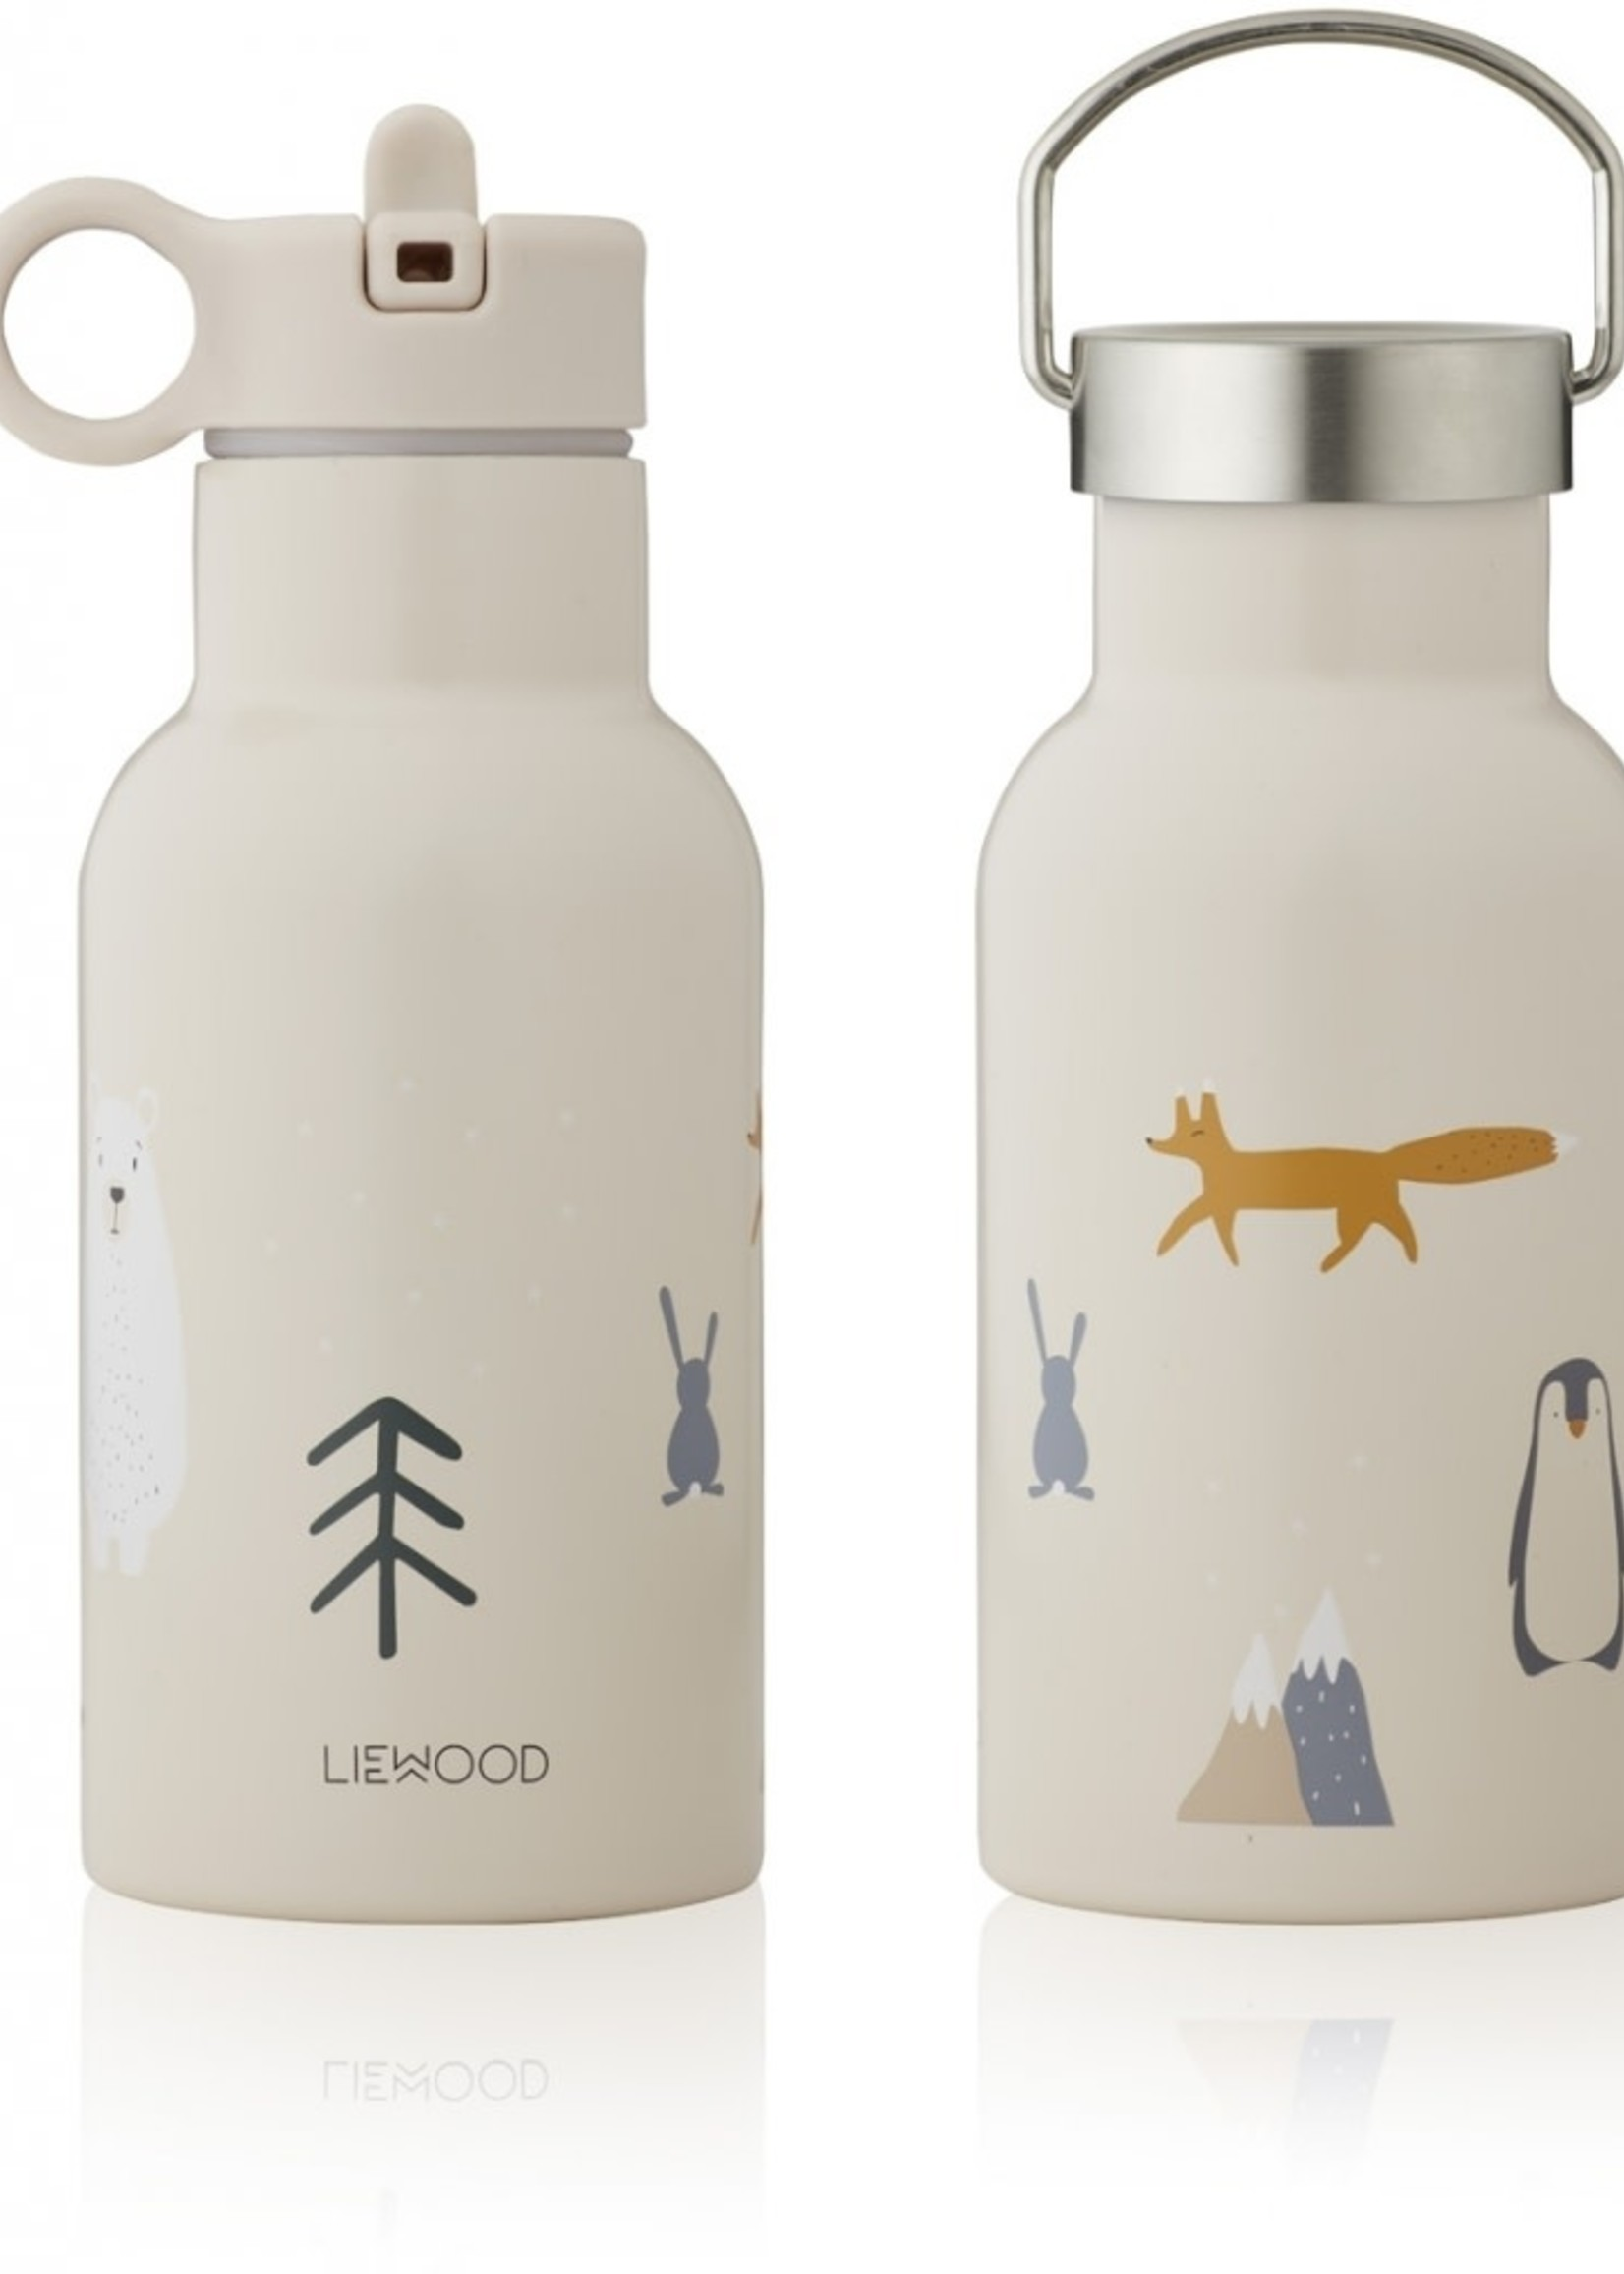 liewood Liewood-SS21 Anker water bottle-LW13072